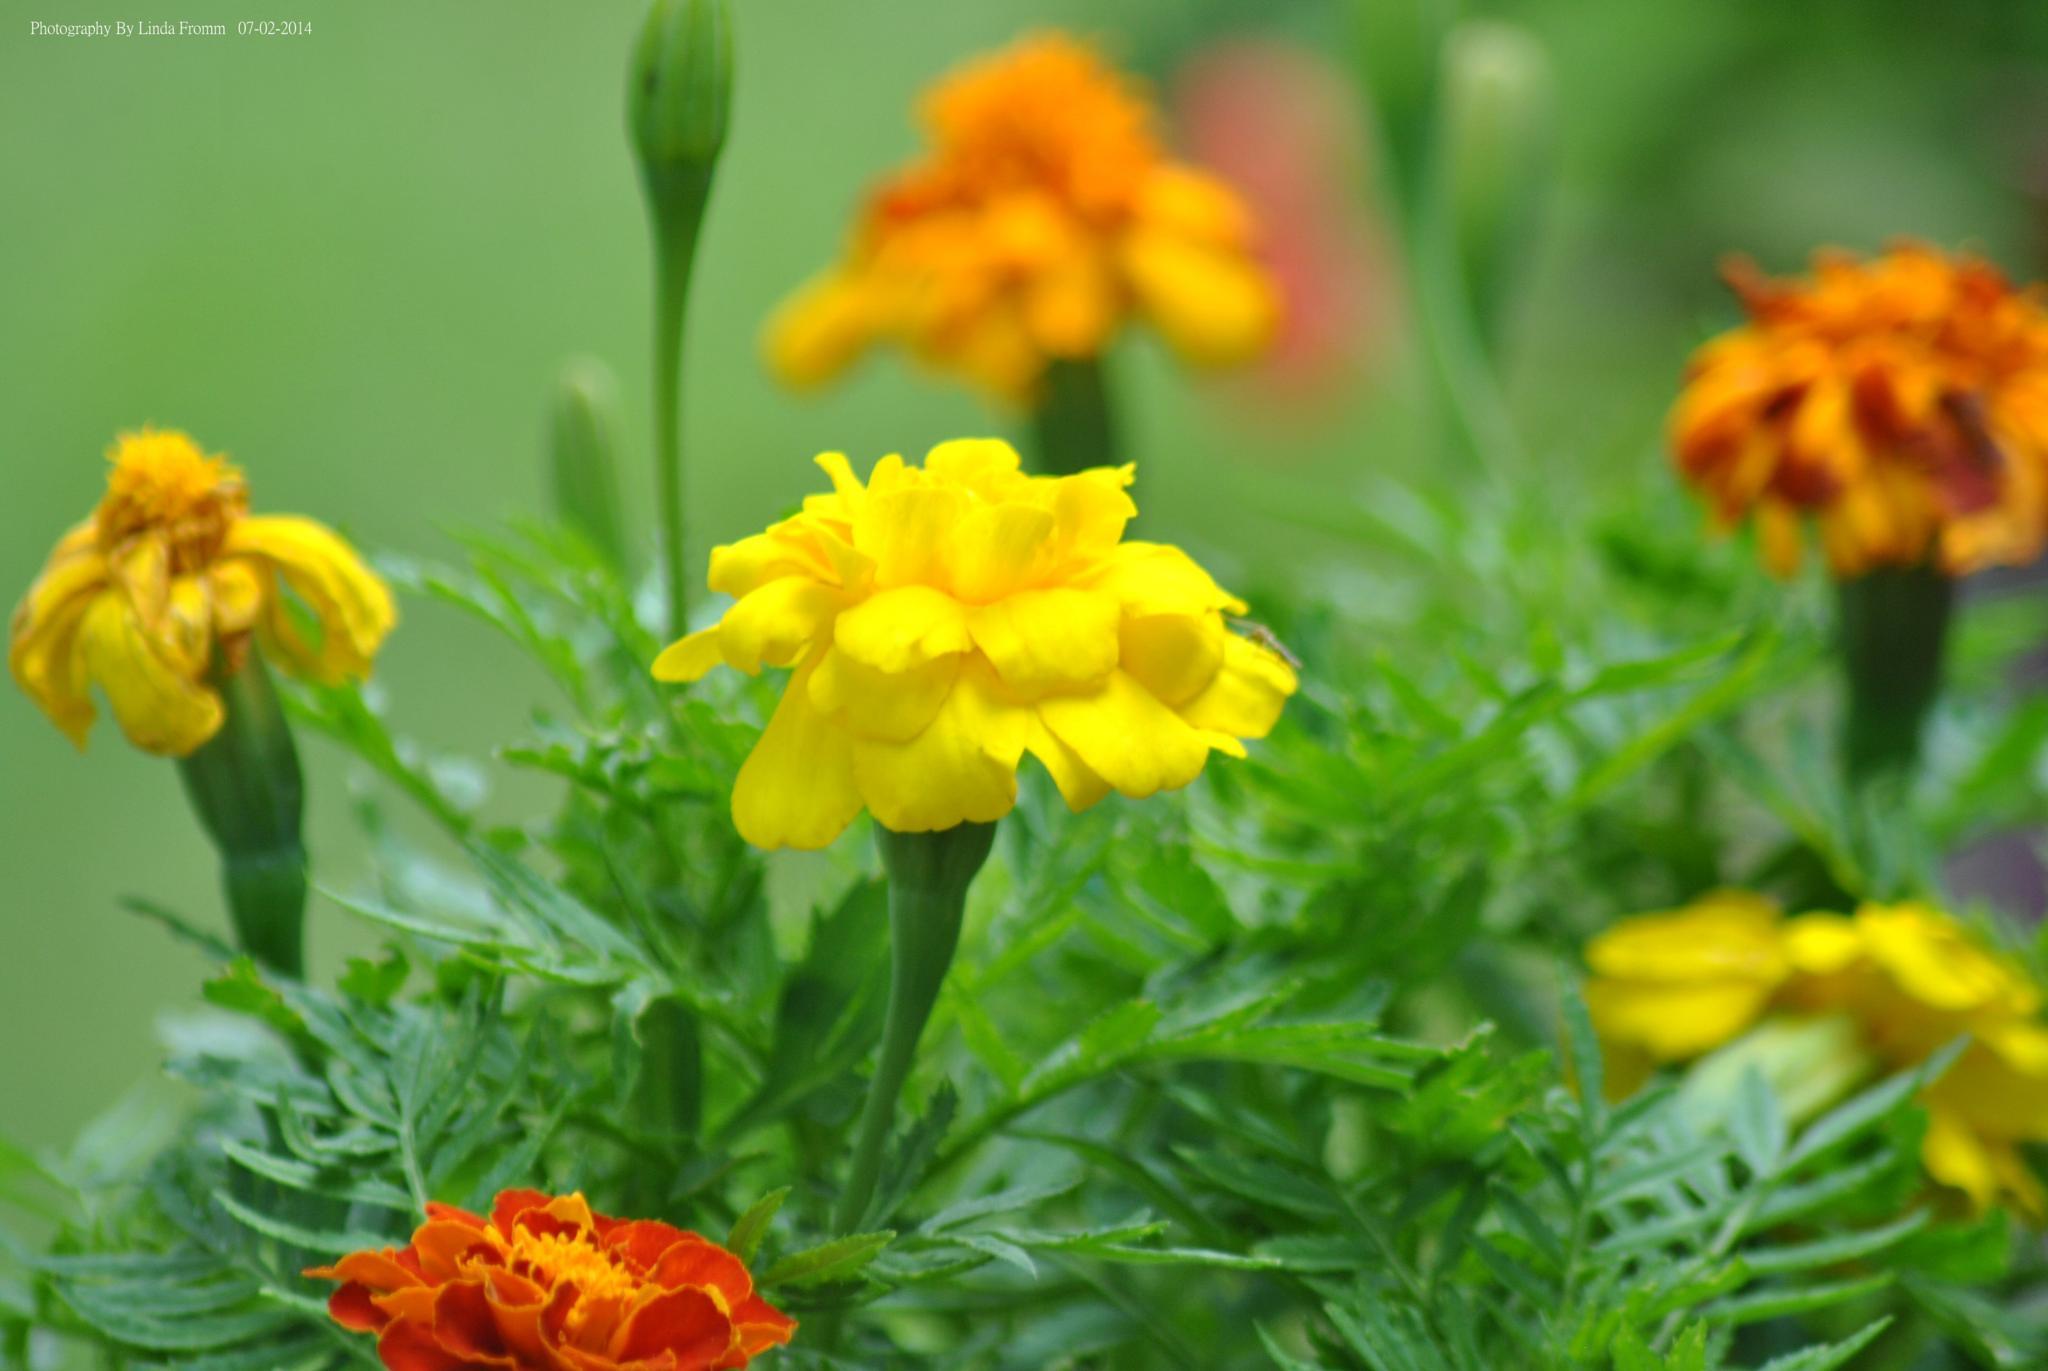 Marigolds by Linda Gifford